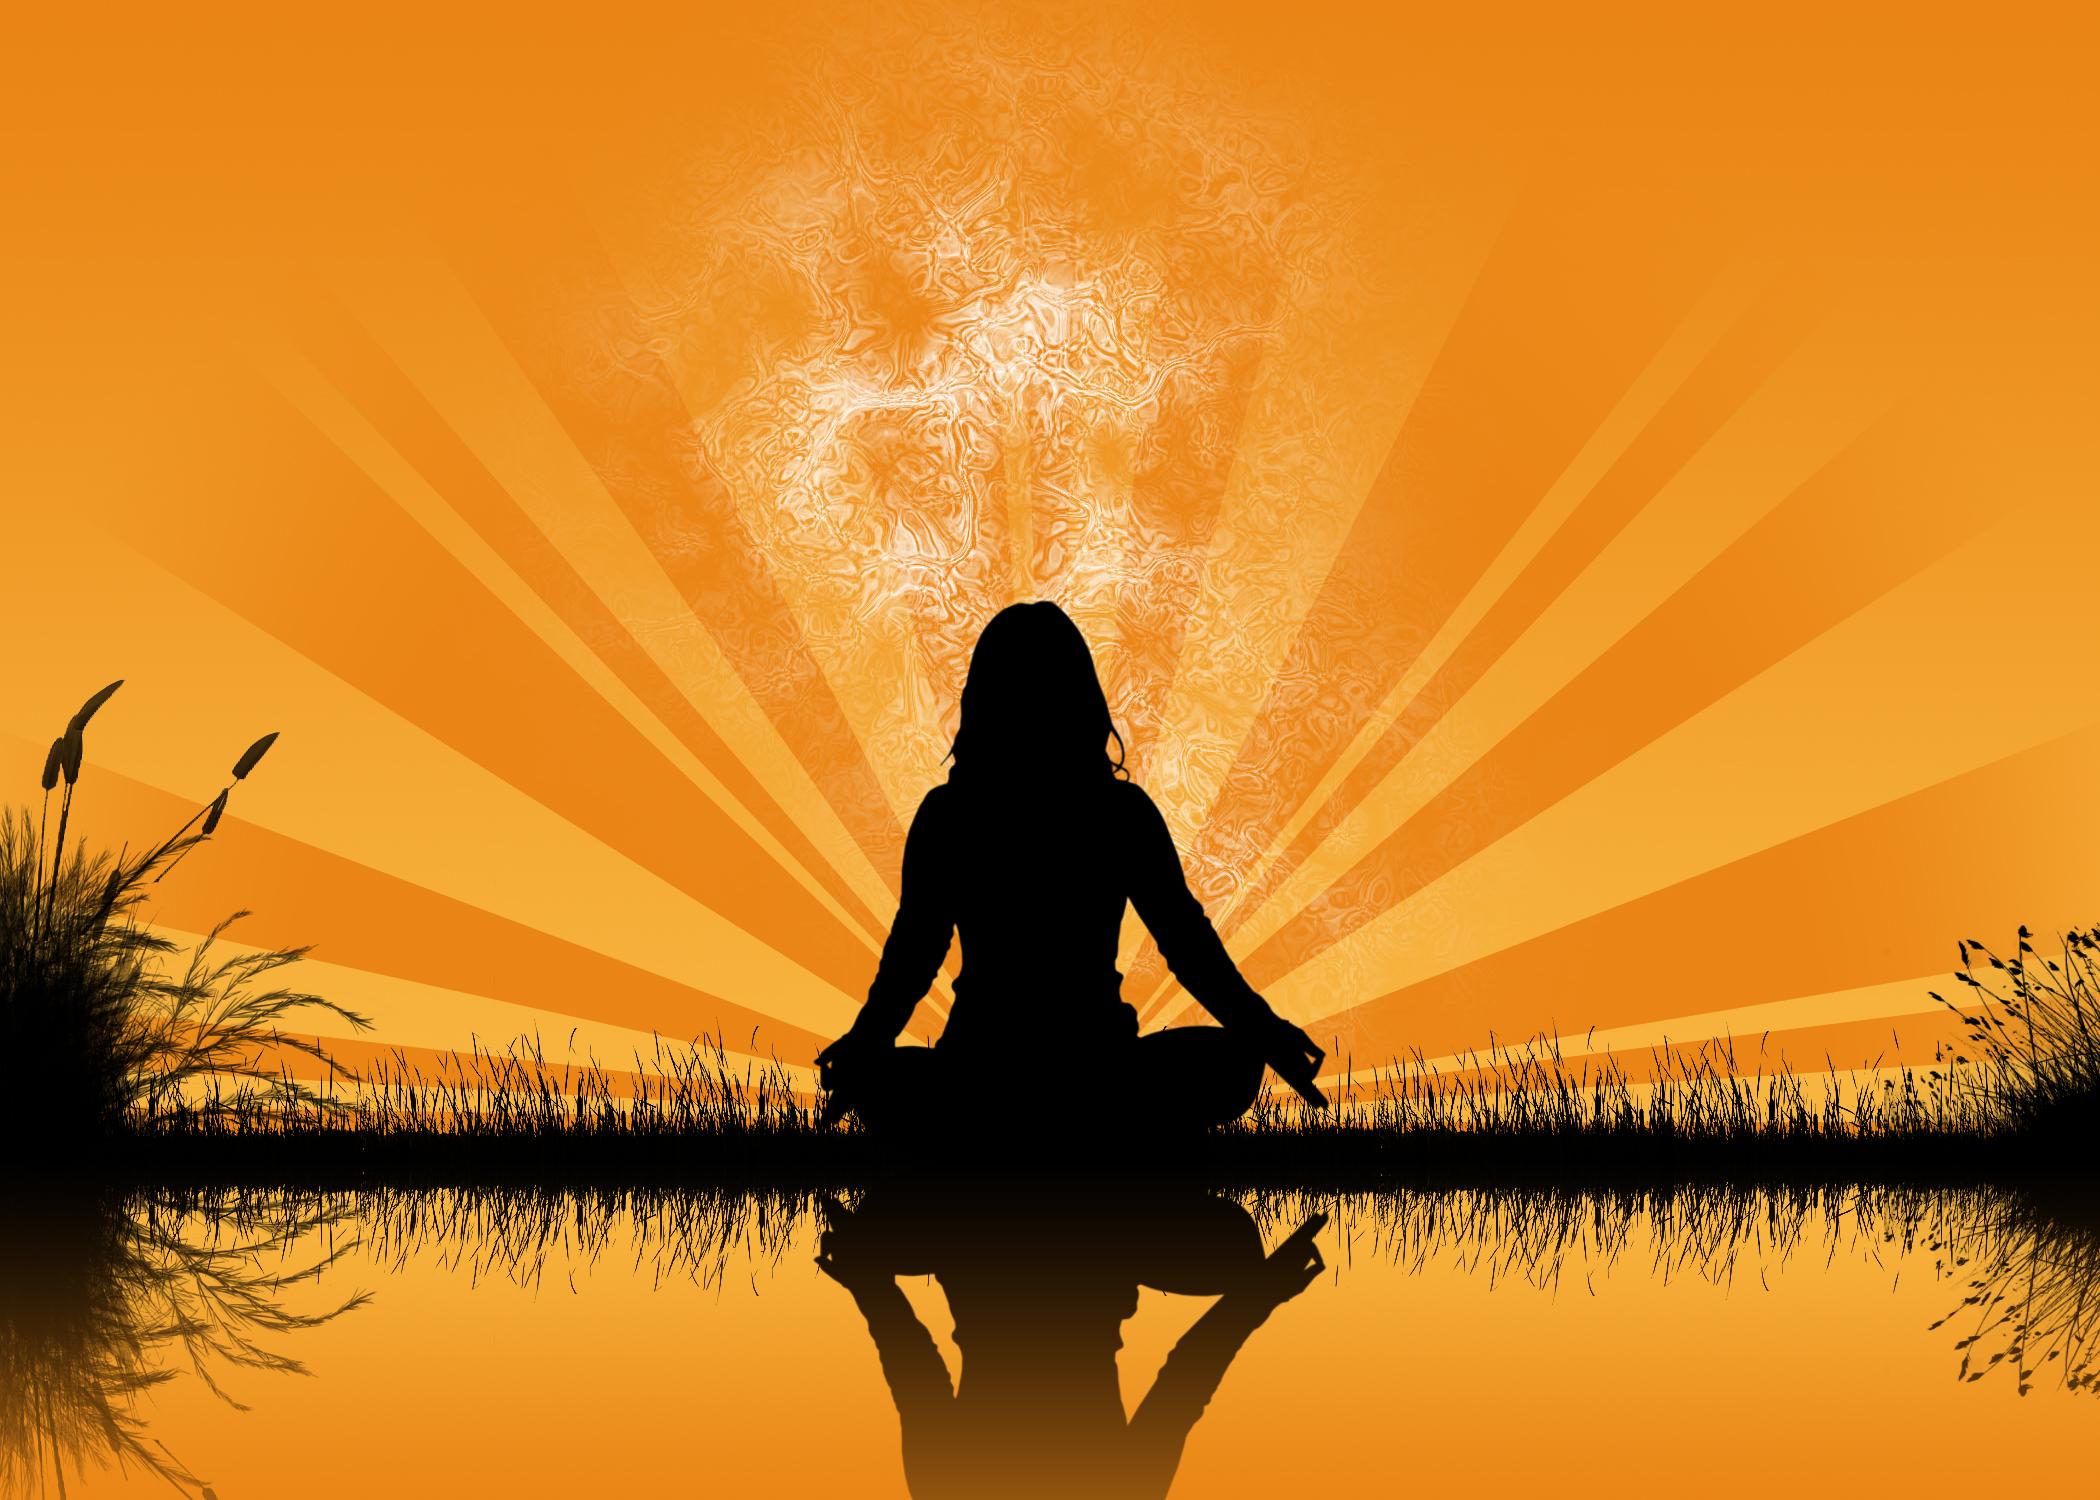 http://greatmiddleway.files.wordpress.com/2011/03/shiningbuddha.jpg